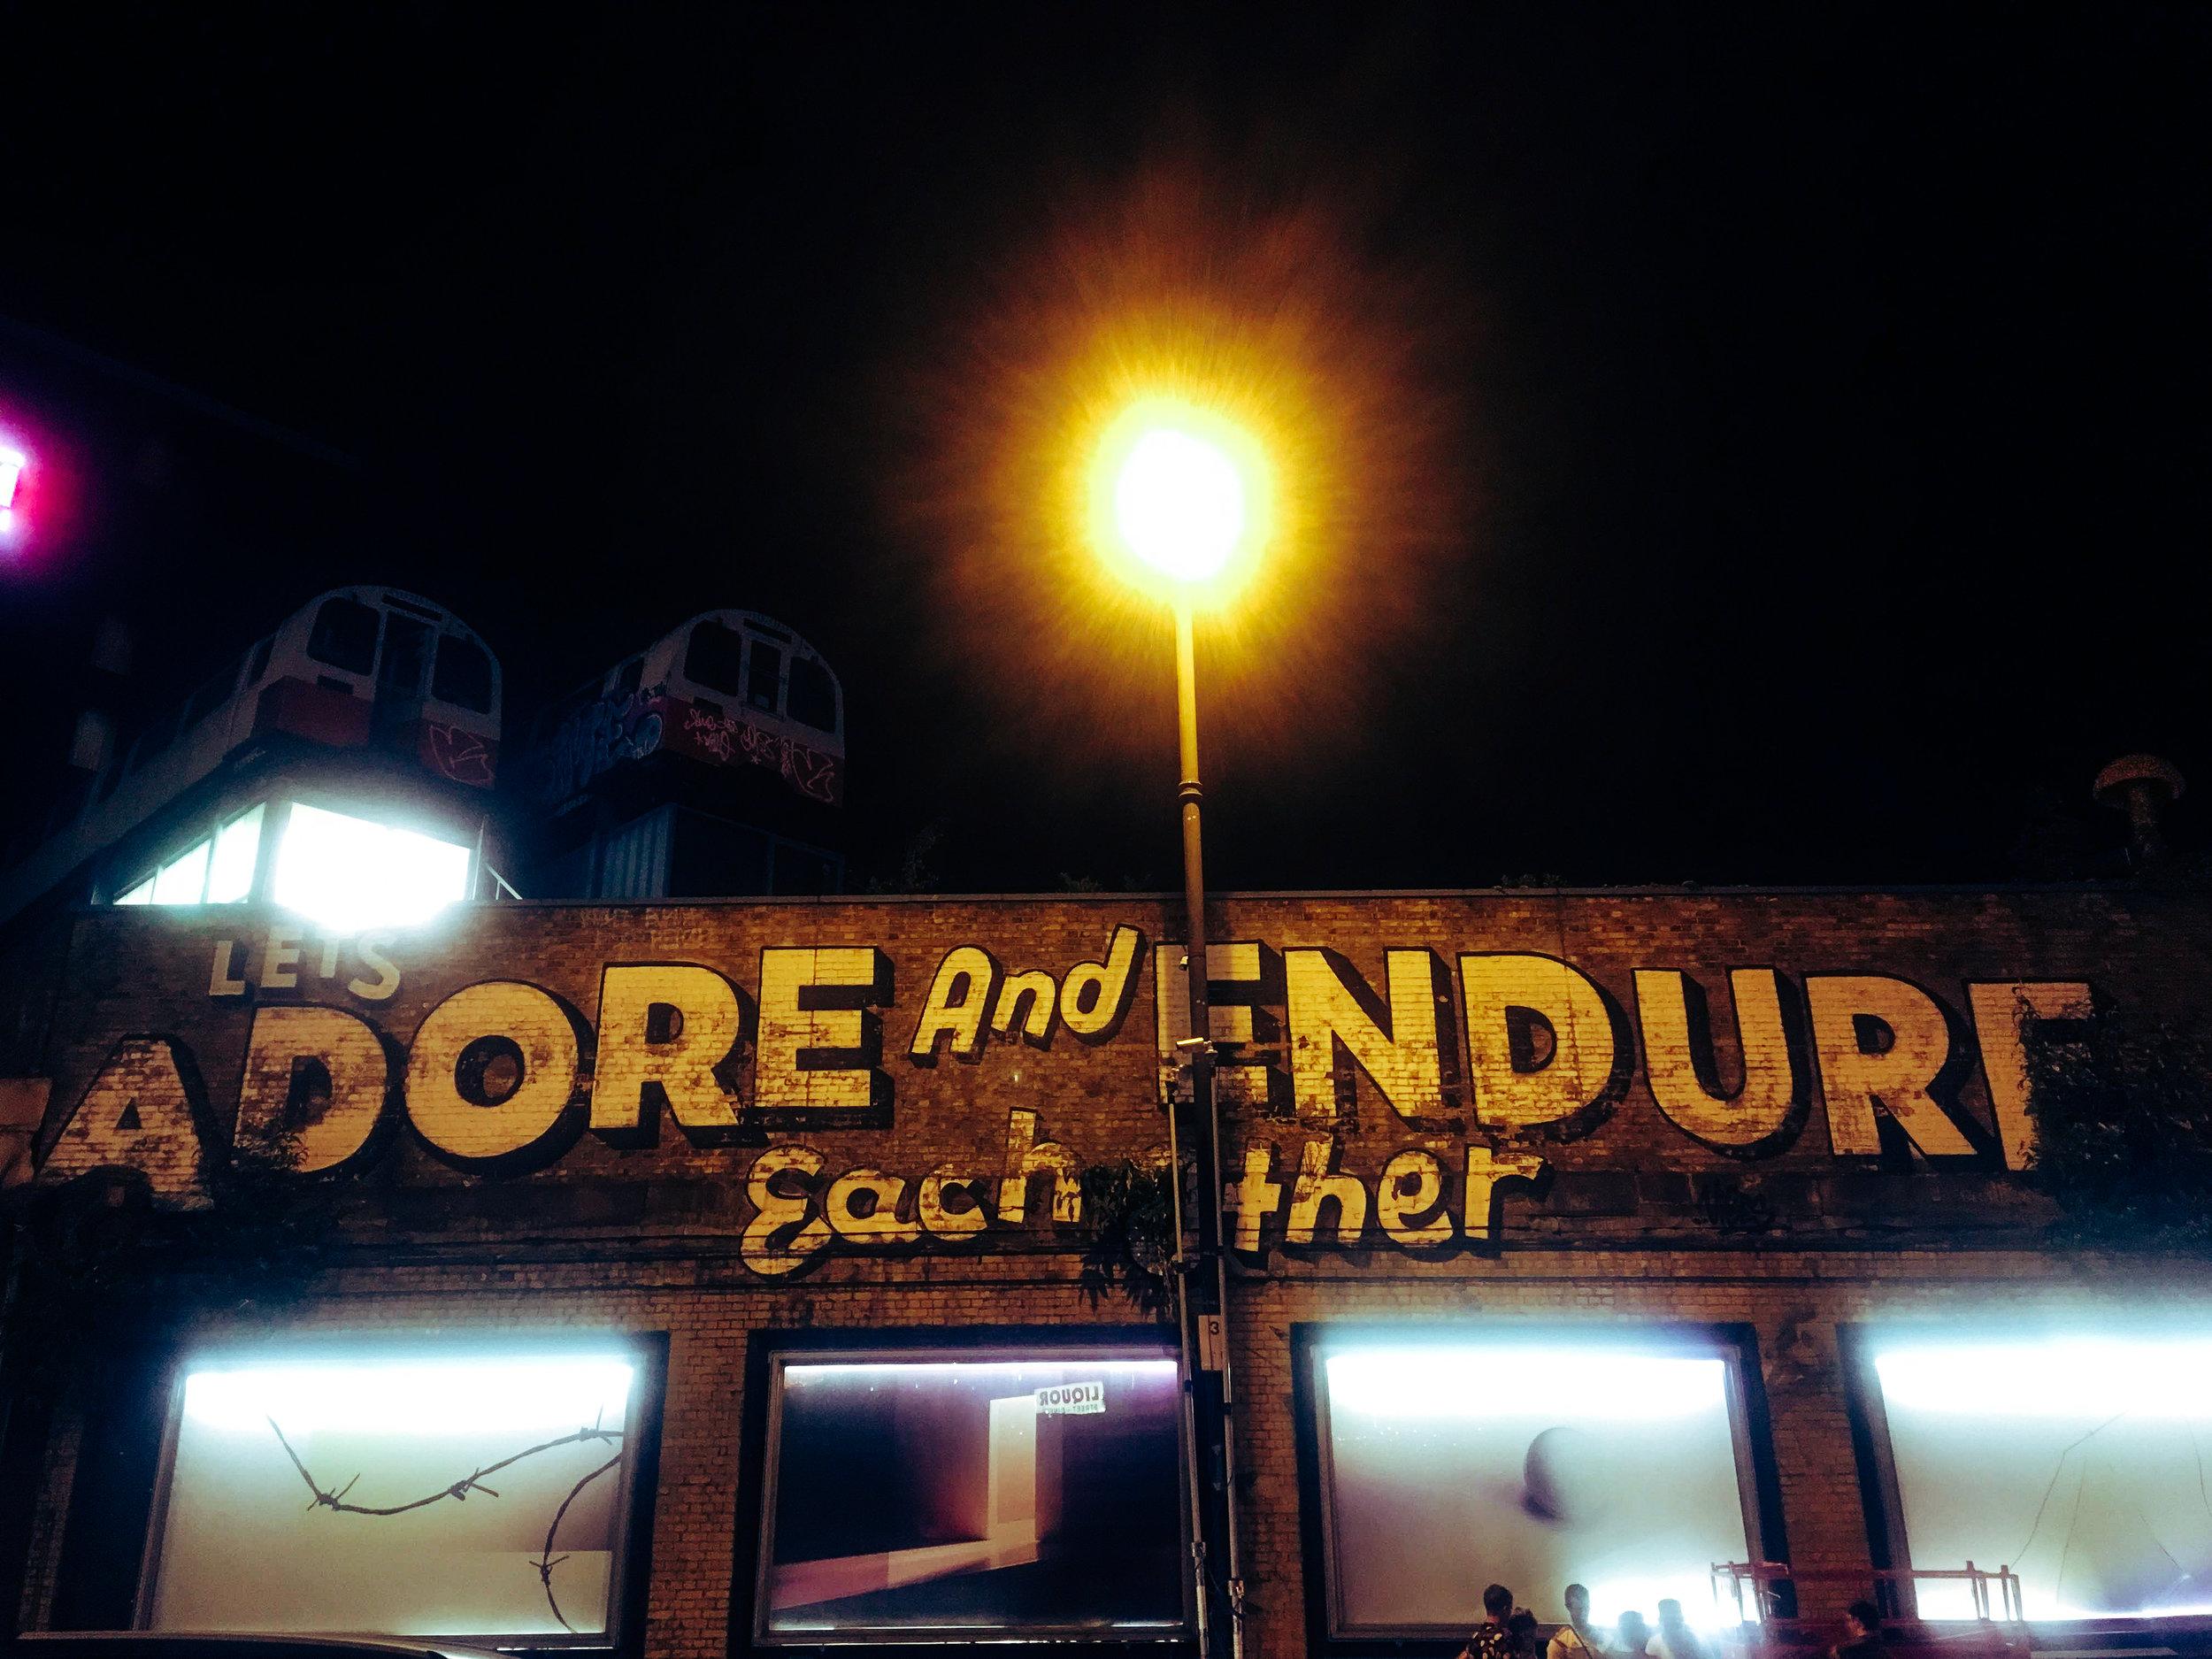 AdoreandEdure.jpg